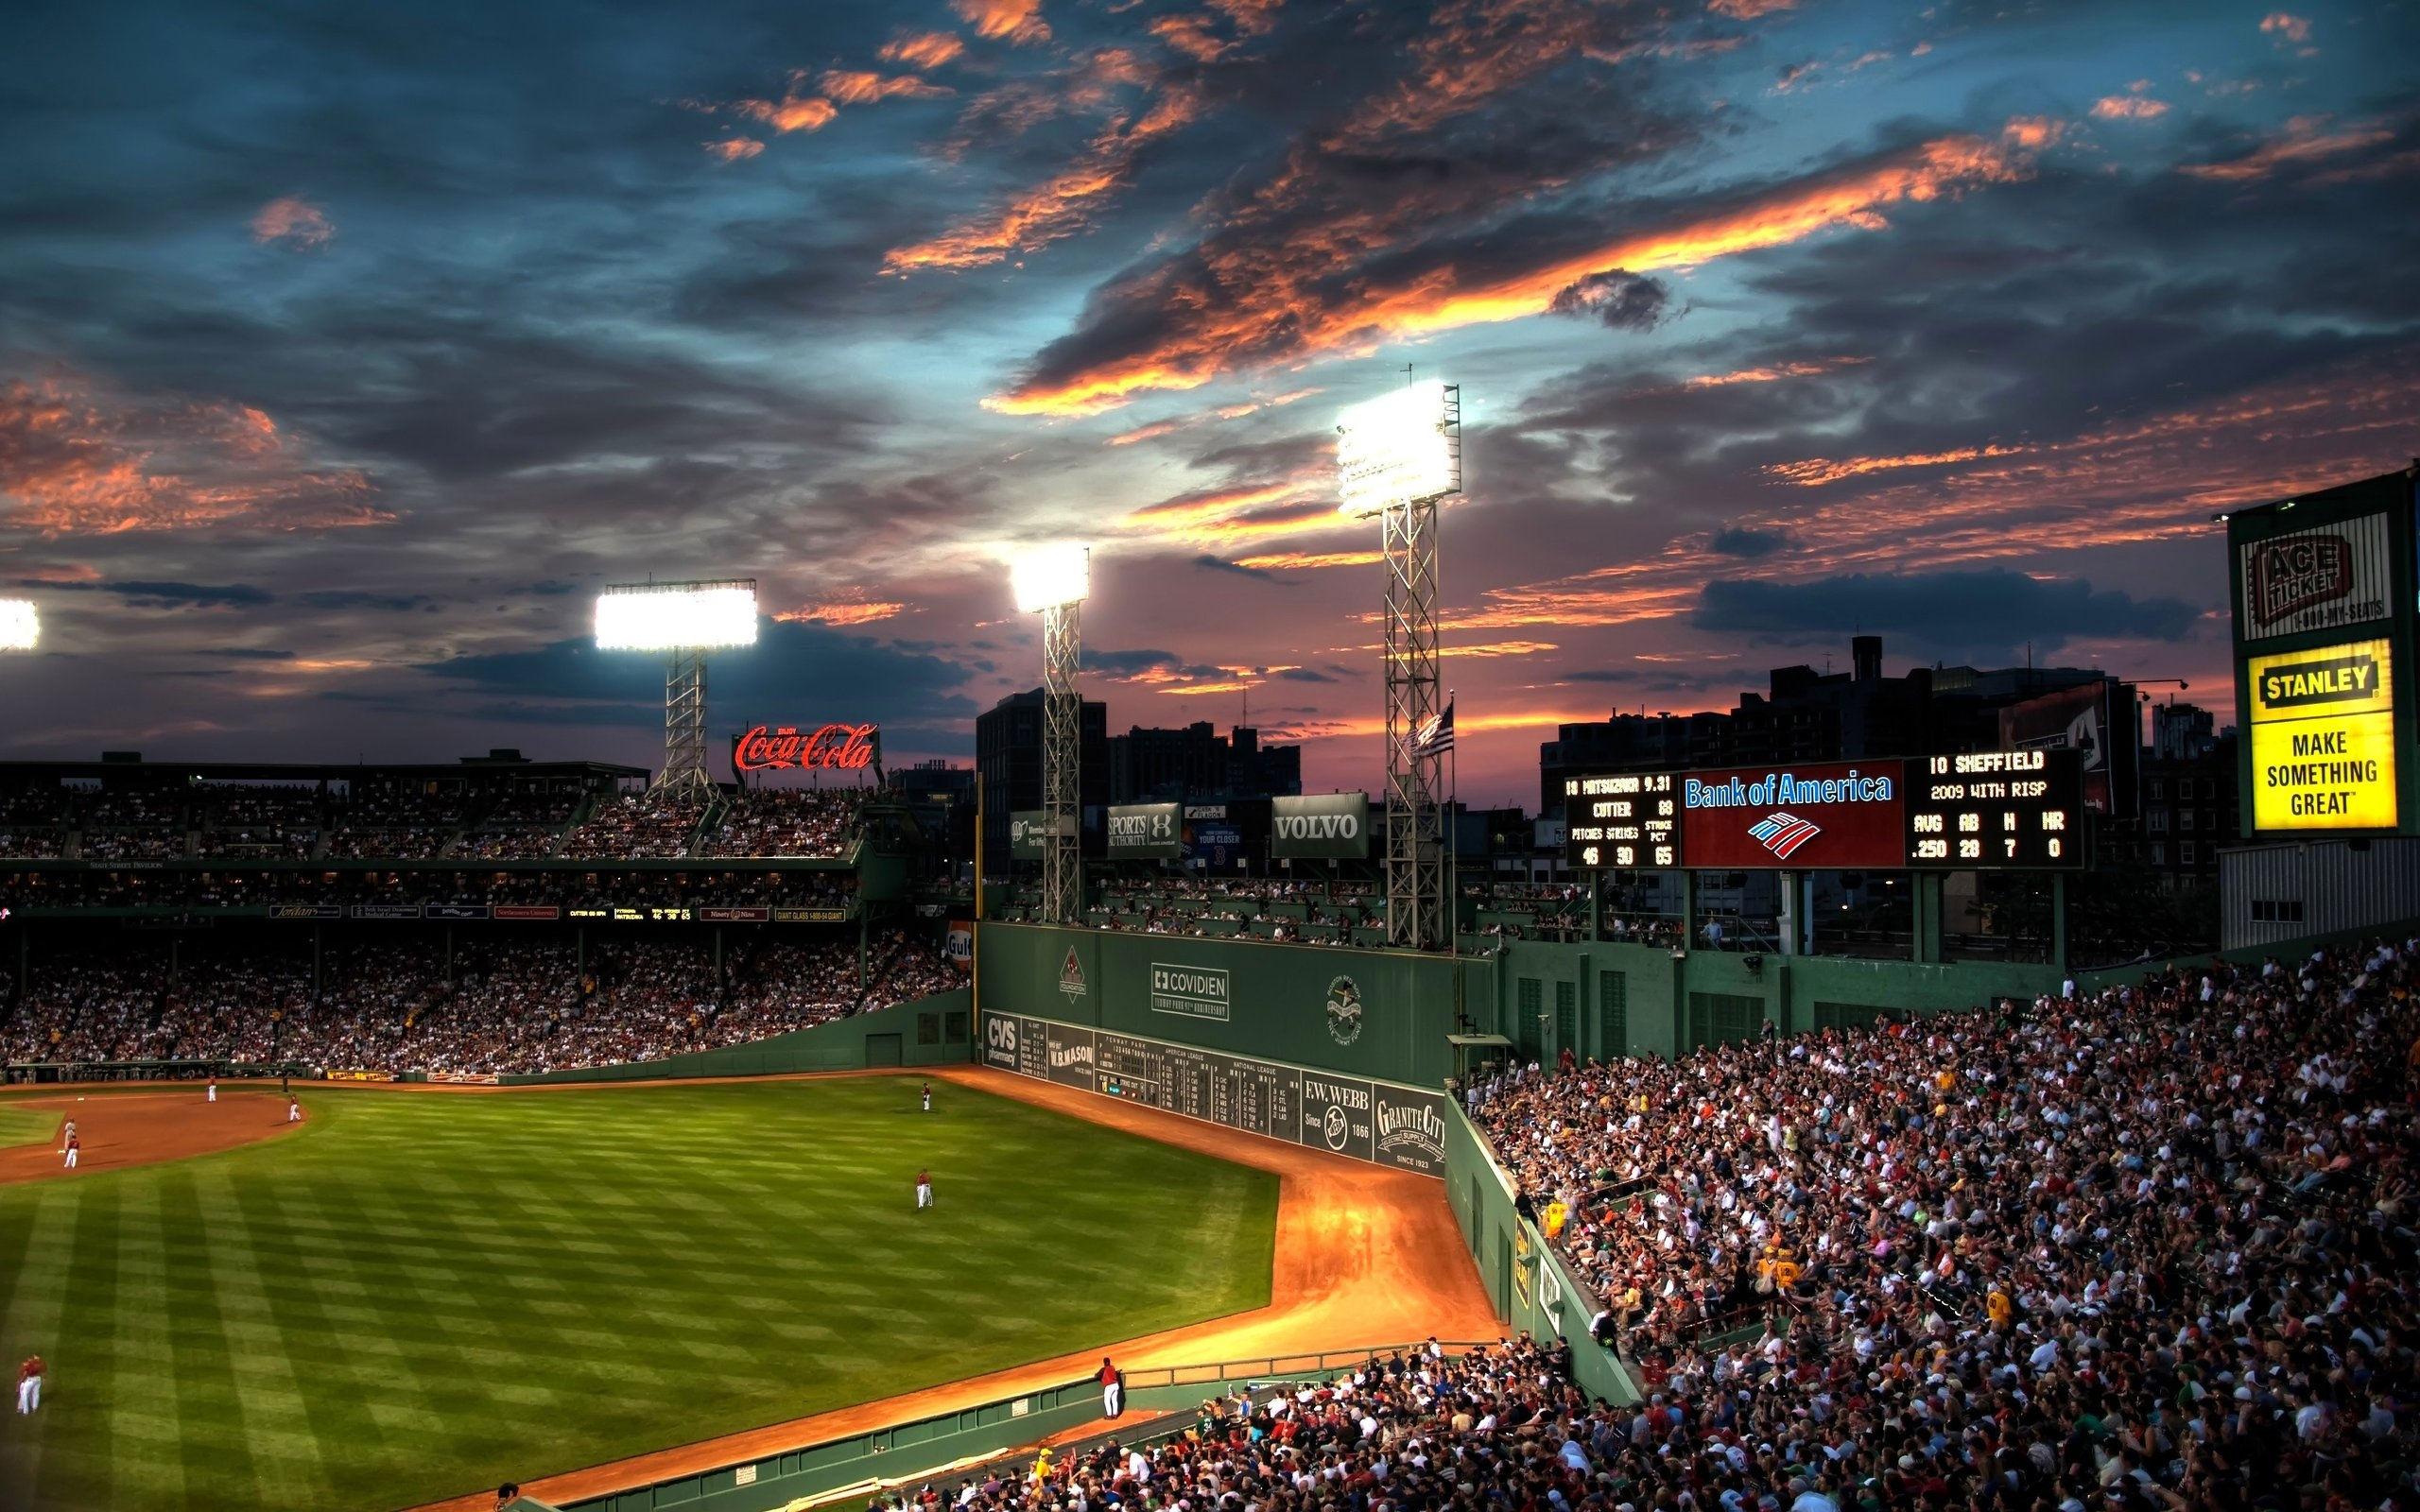 Fall Wallpaper Hd Free Boston Red Sox Backgrounds Free Download Pixelstalk Net